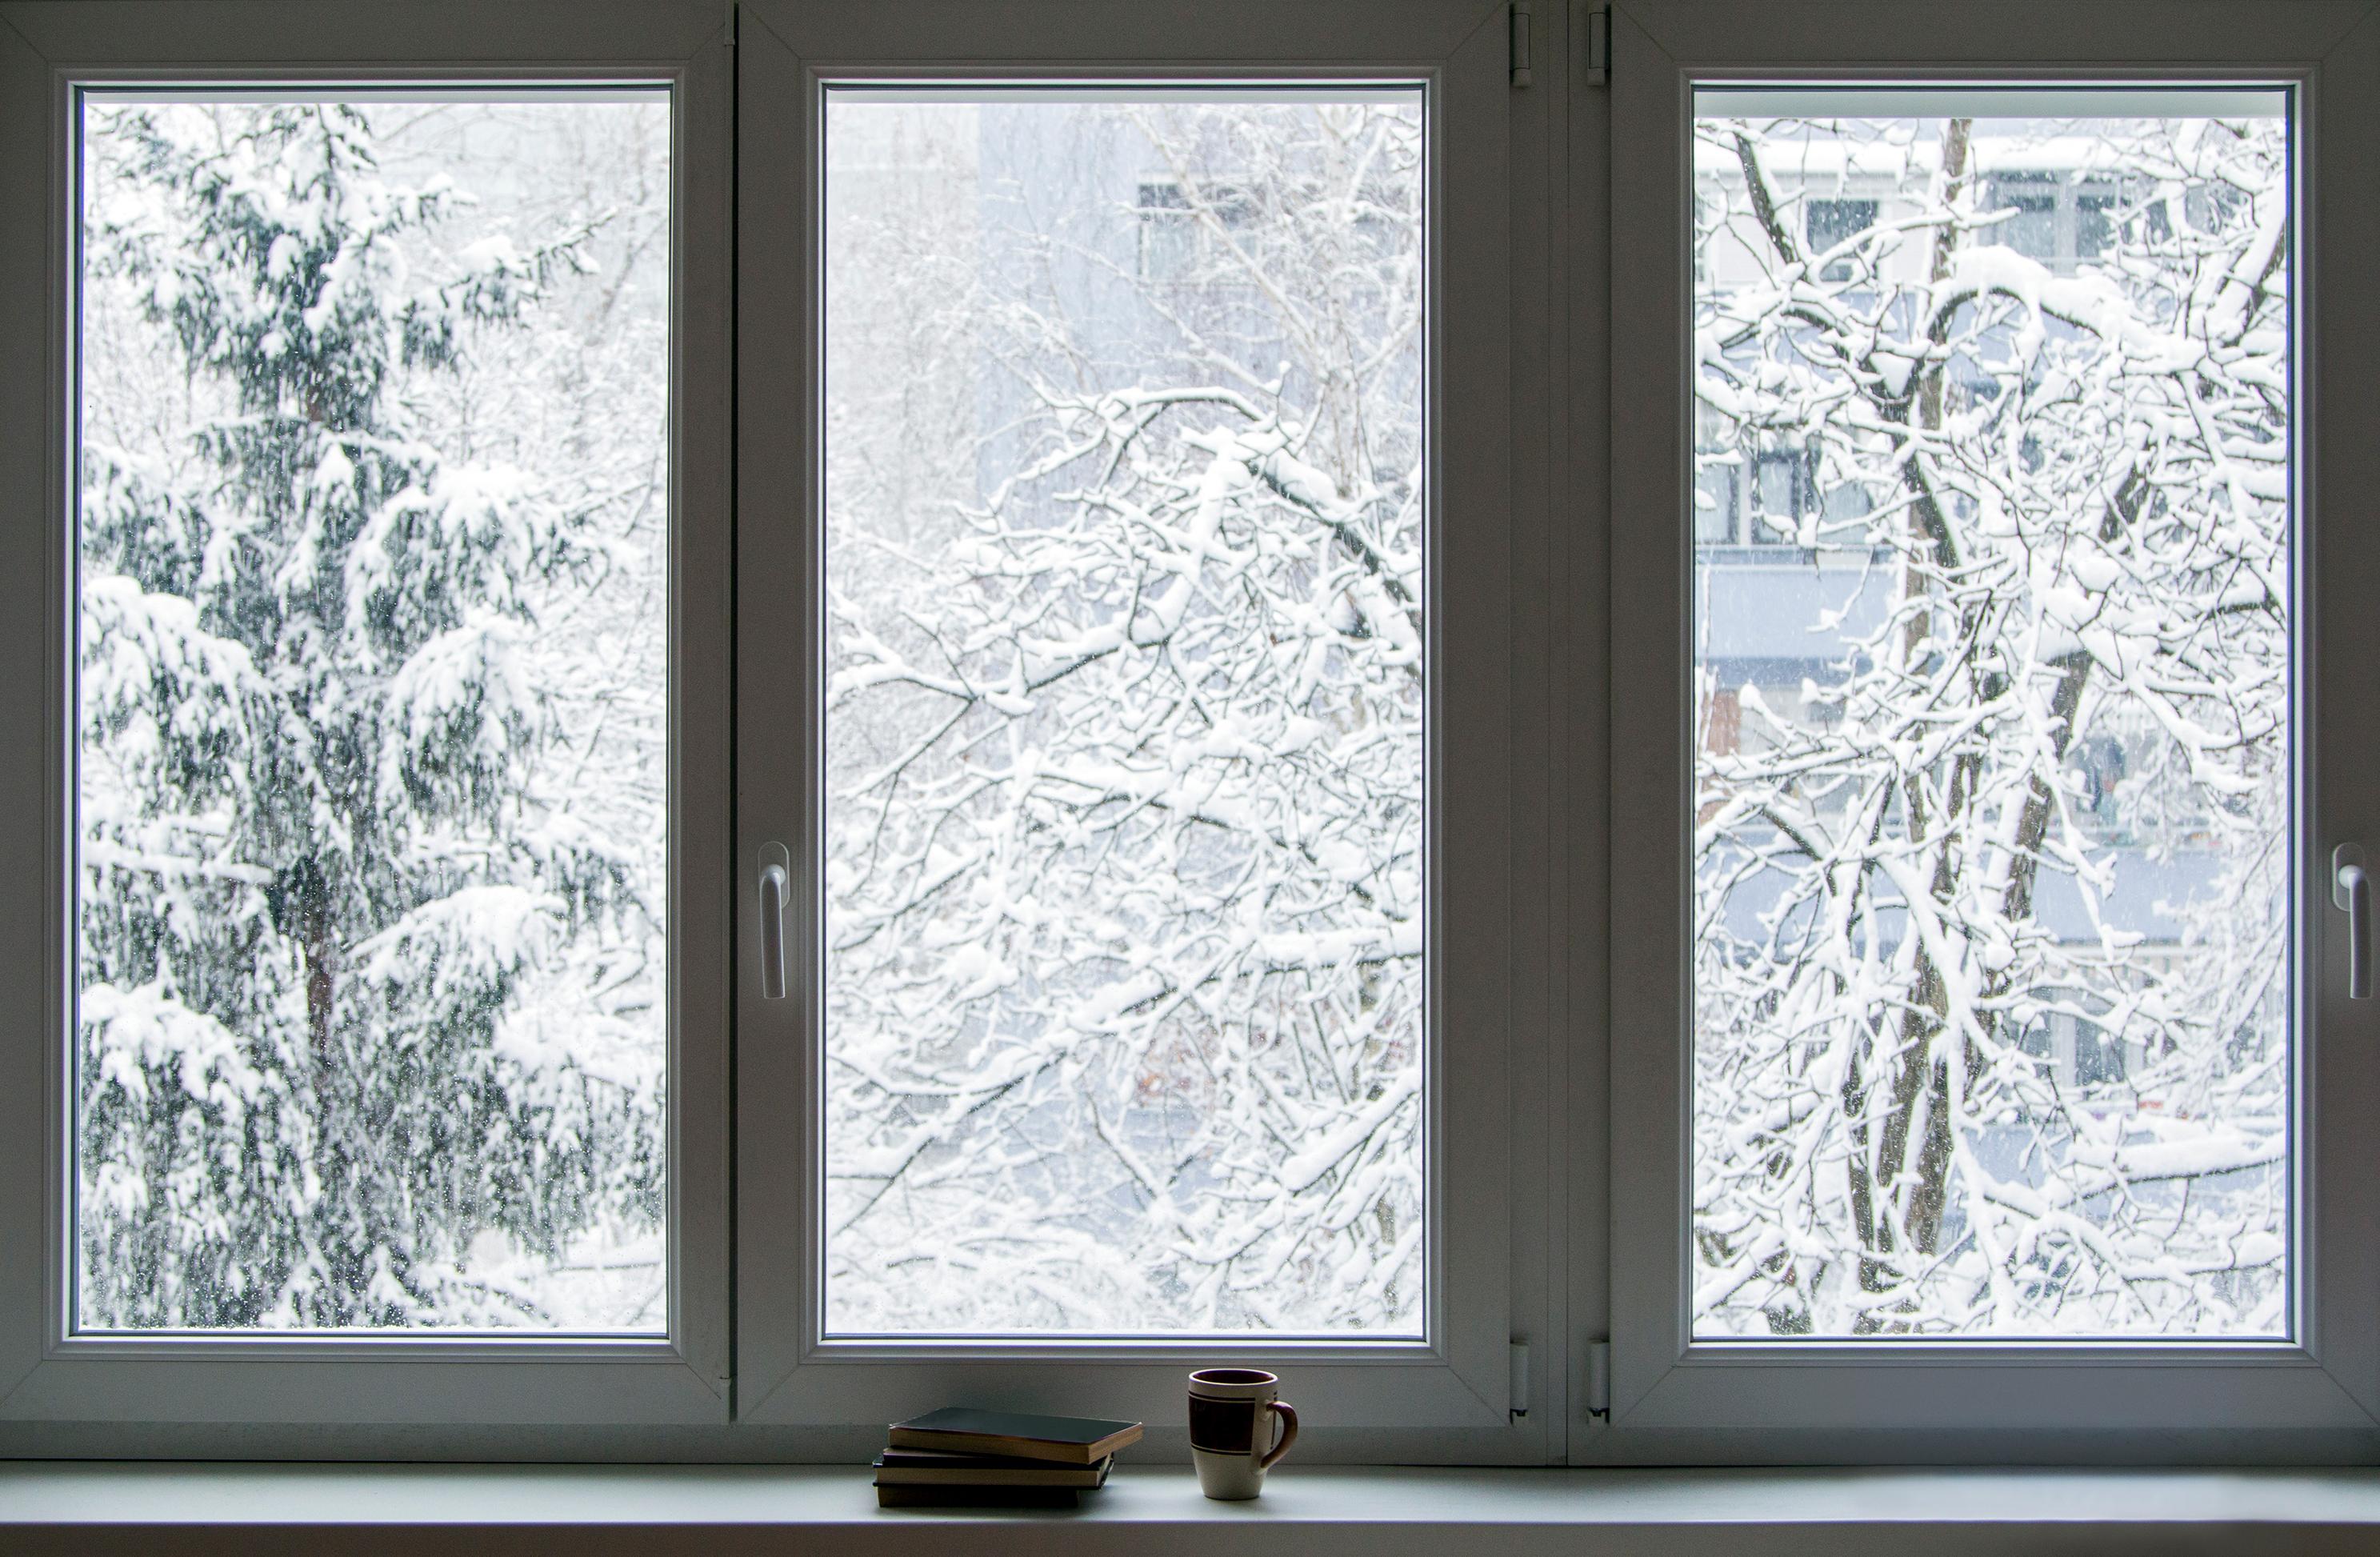 Winter view outside of window.